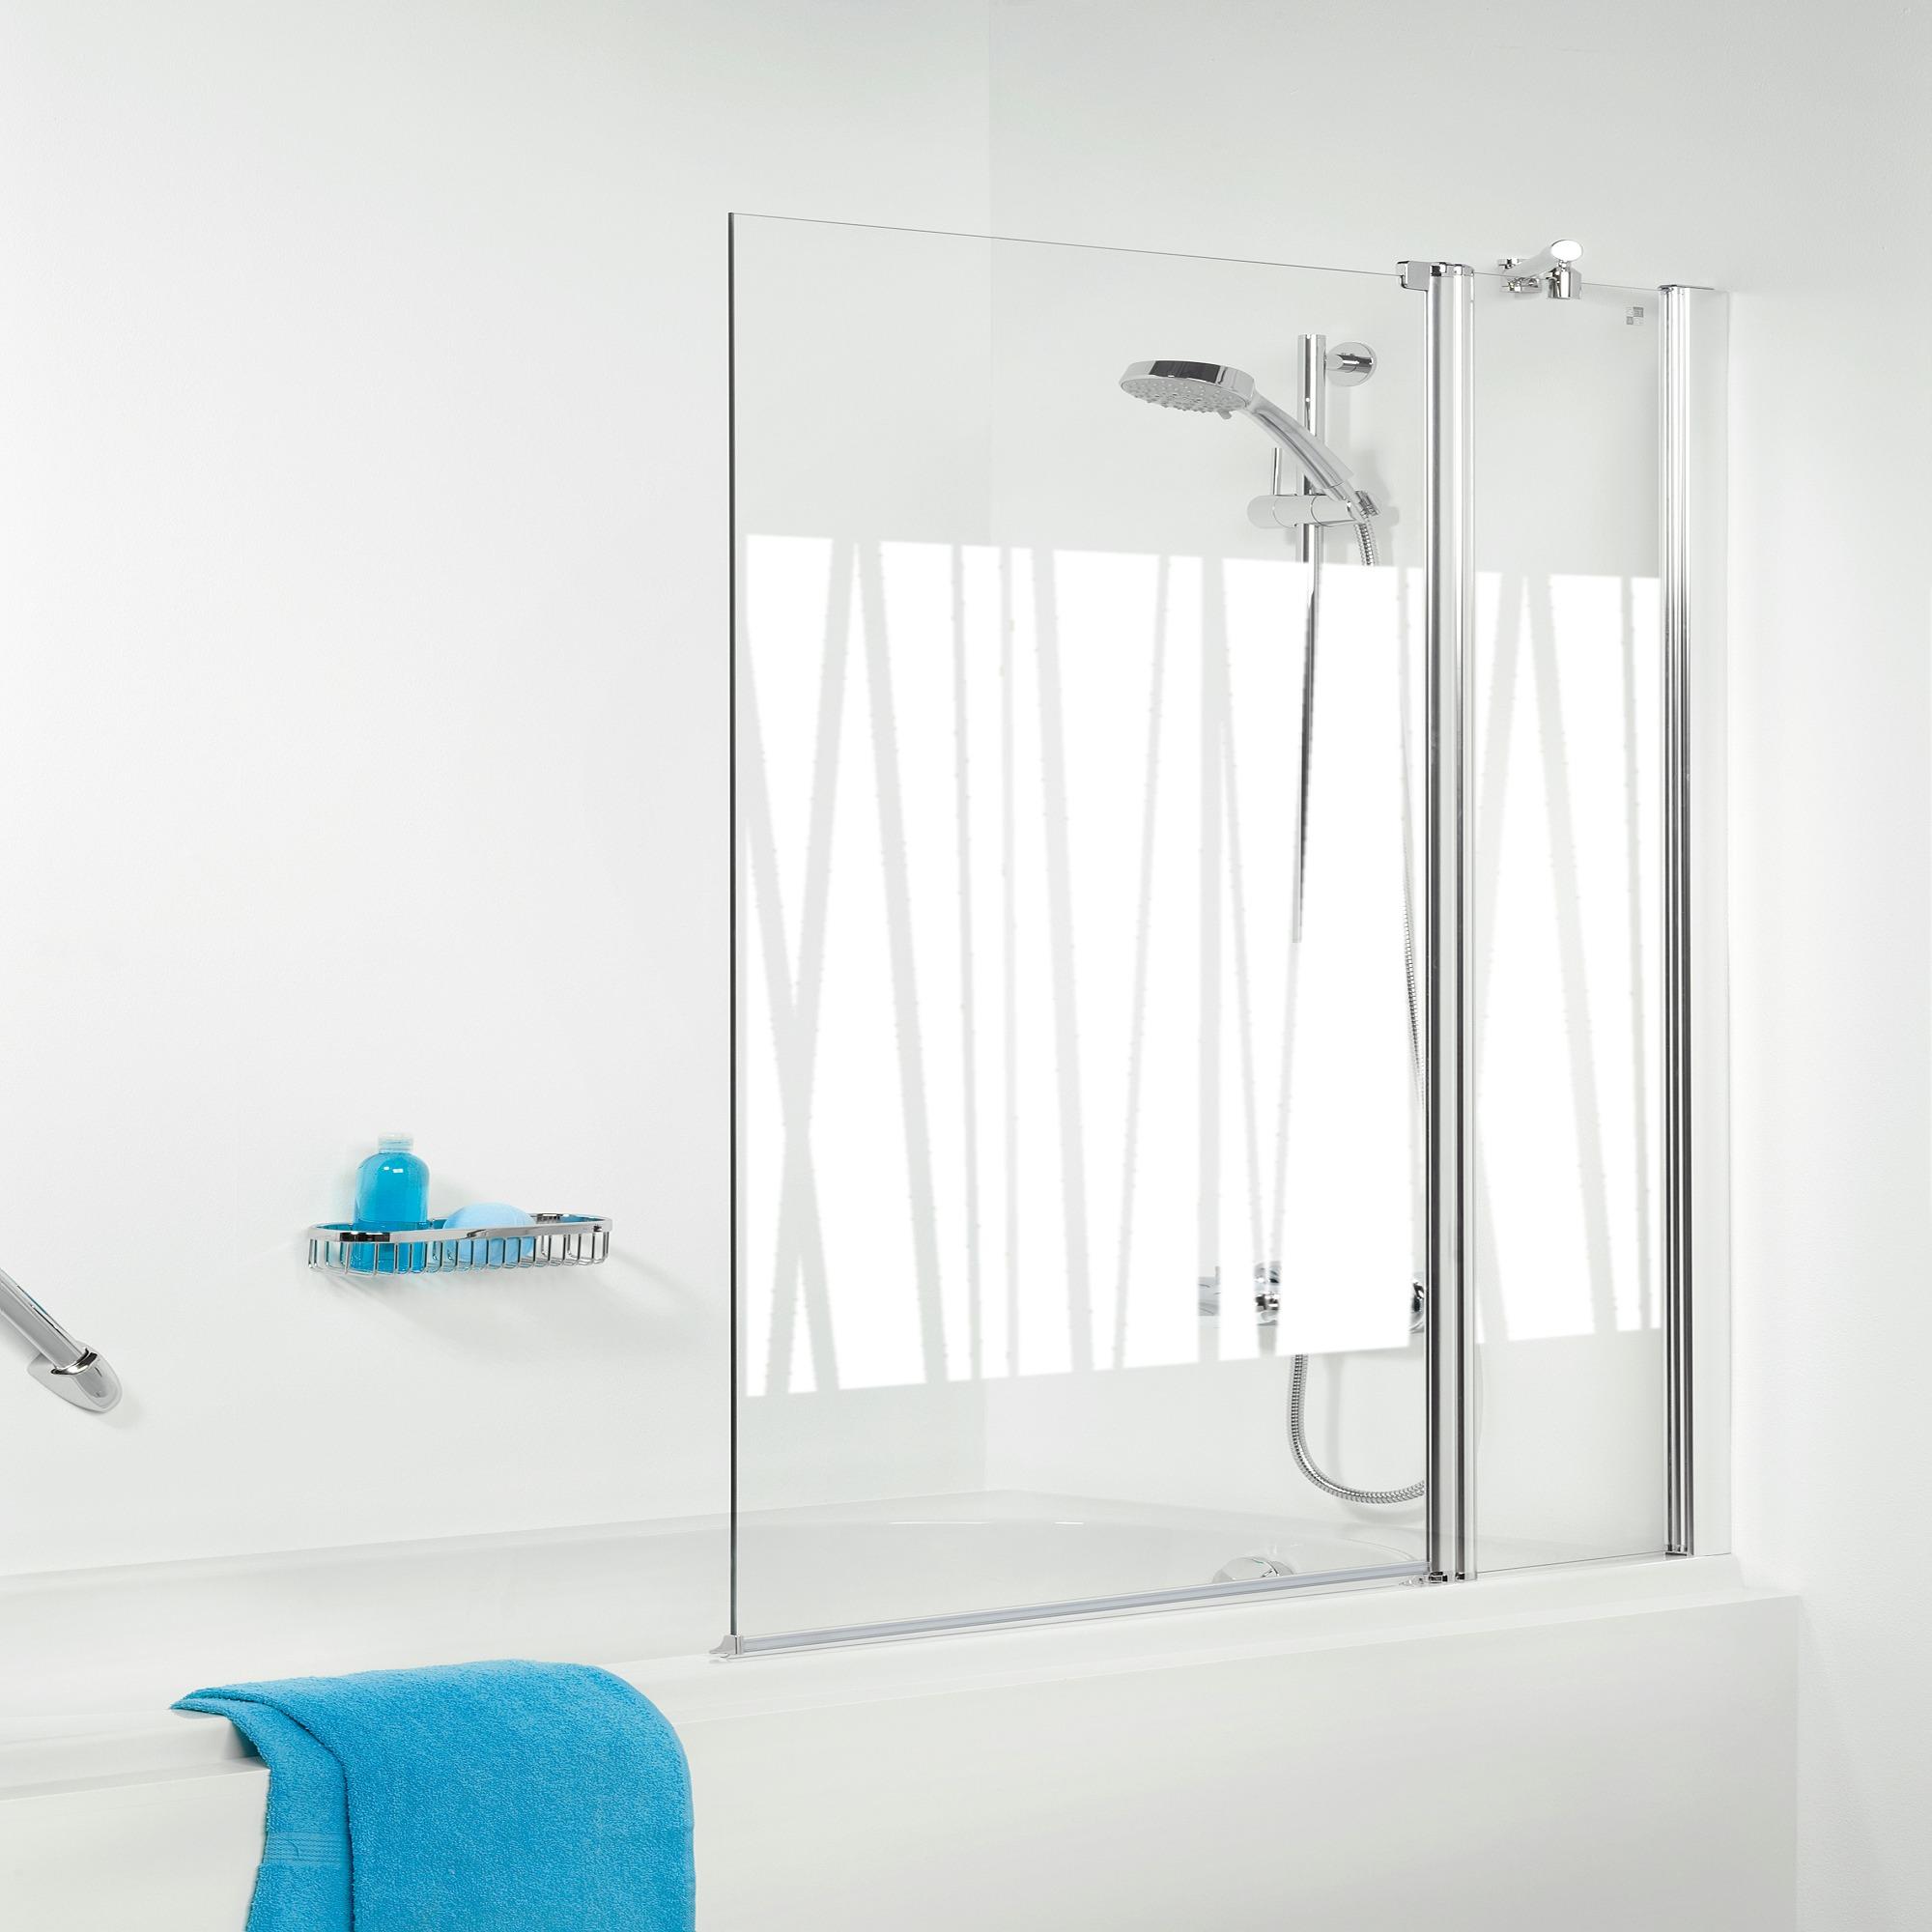 Sealskin Get Wet S105 badzijwand 2 delige 100x140cm chroom kabana decor glas